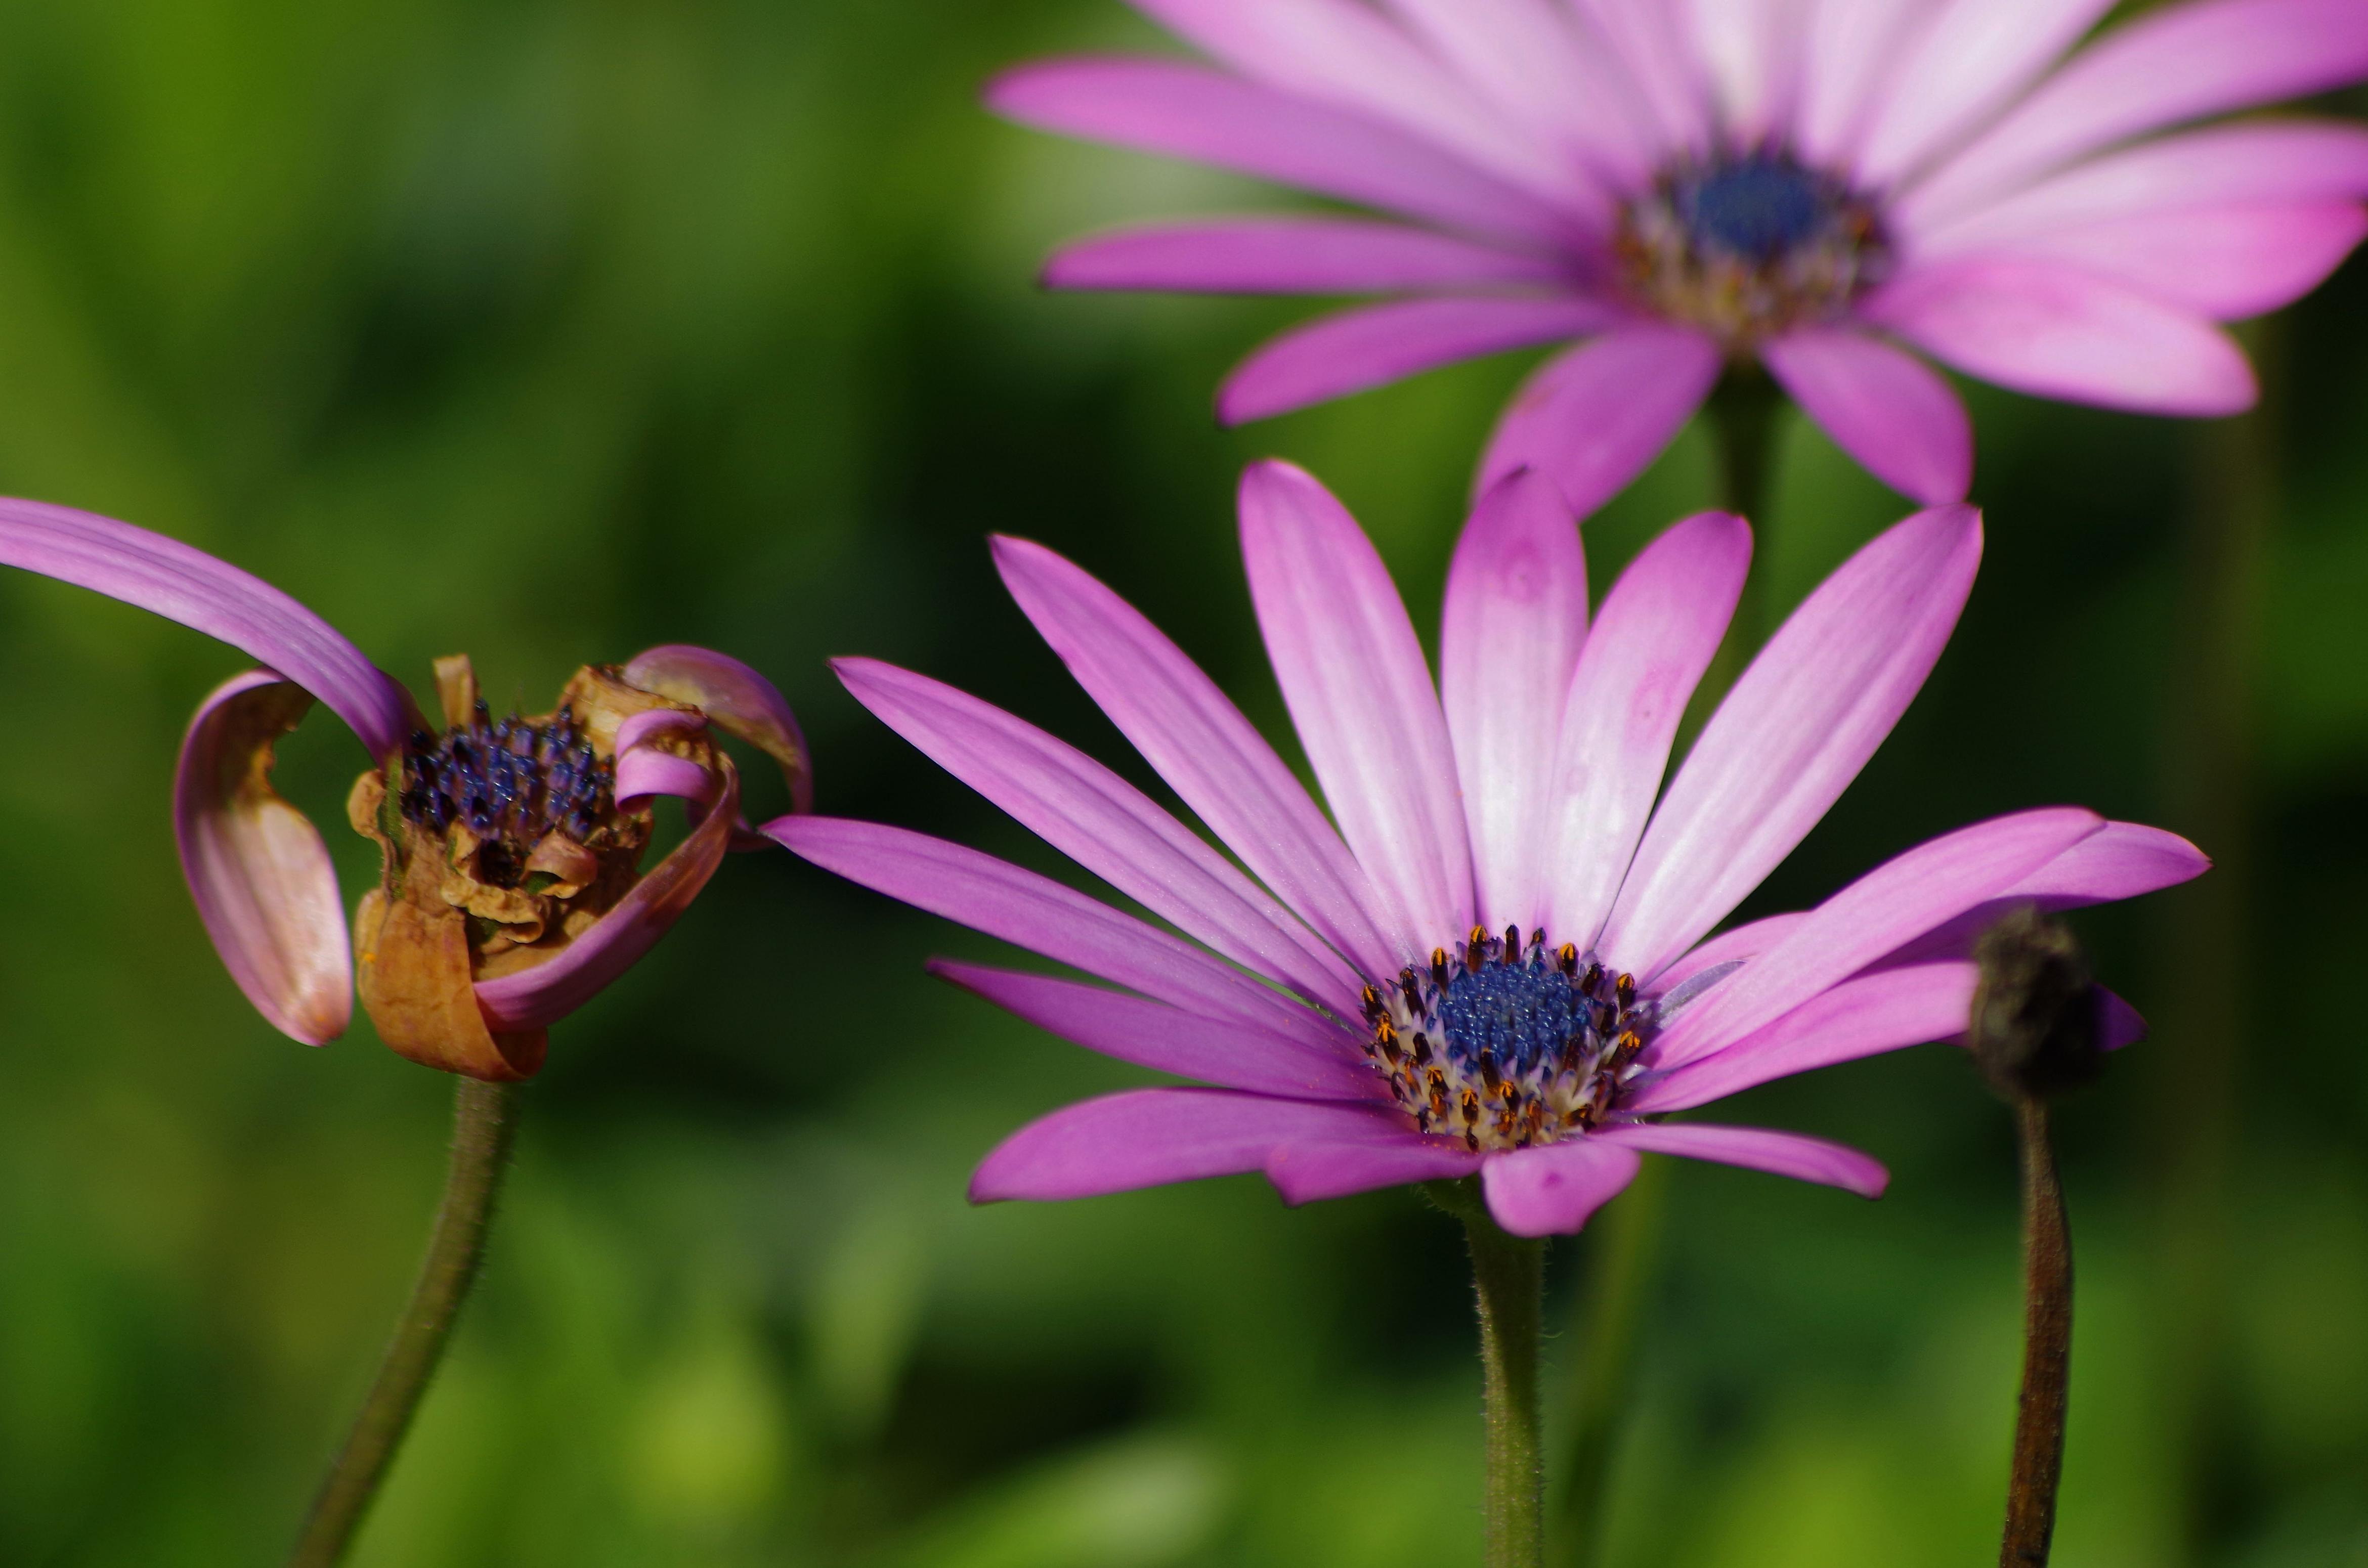 Fondo Primavera álbum Classic Flores Violetas: Imagen Gratis: Flor, Naturaleza, Jardín, Flora, Verano